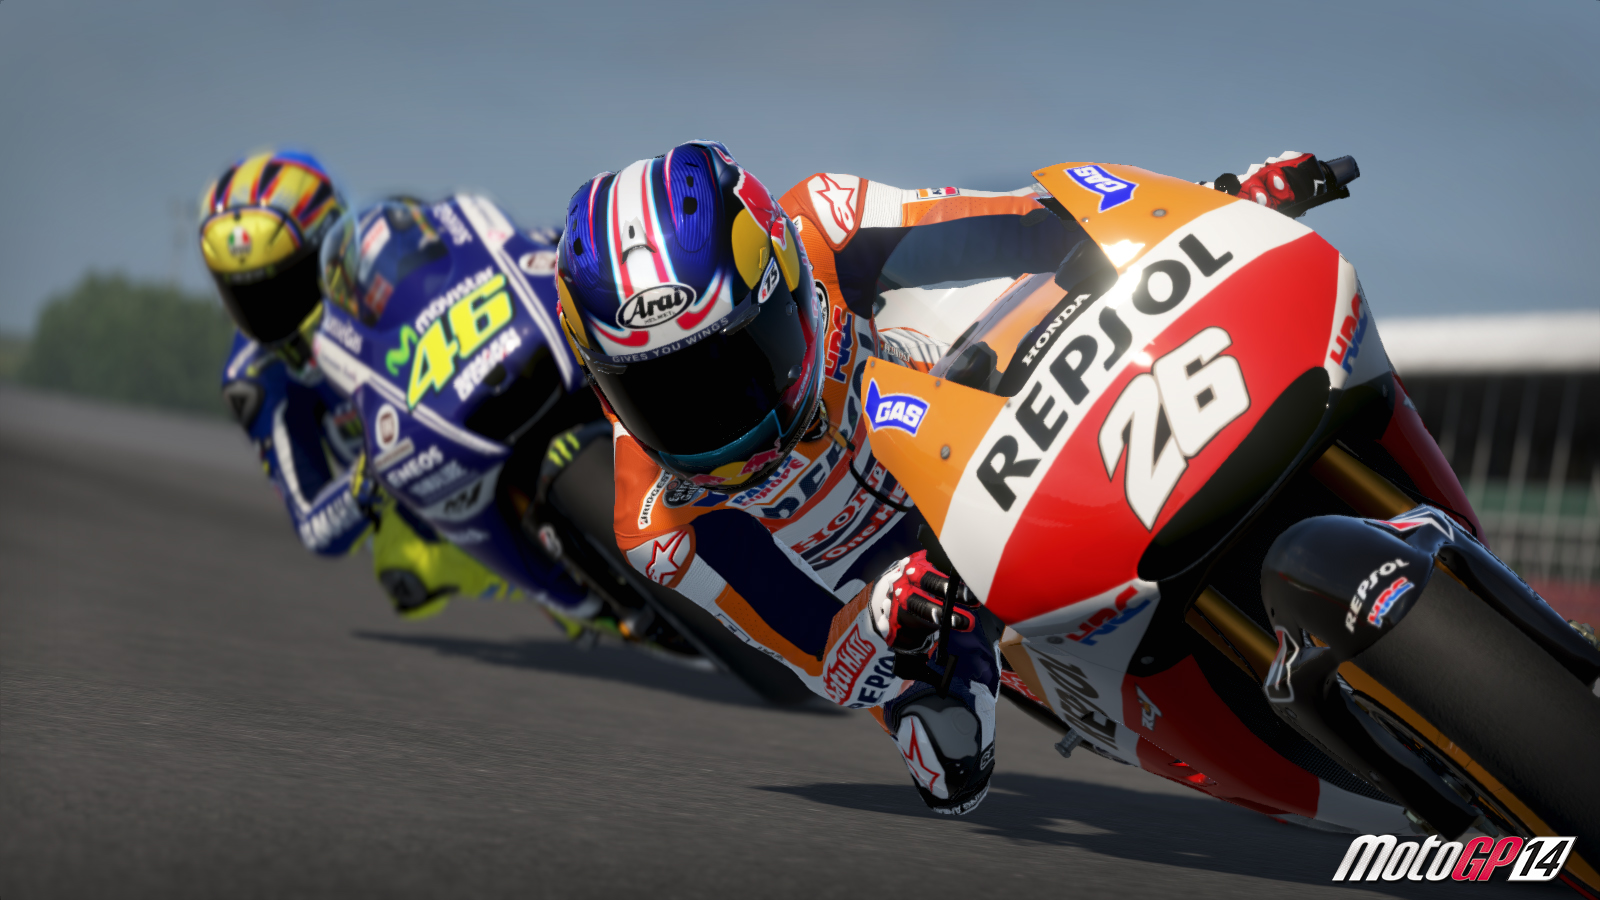 MotoGP 14 Multilenguaje ESPAÑOL XBOX 360 (Región NTSC-U/PAL) 10